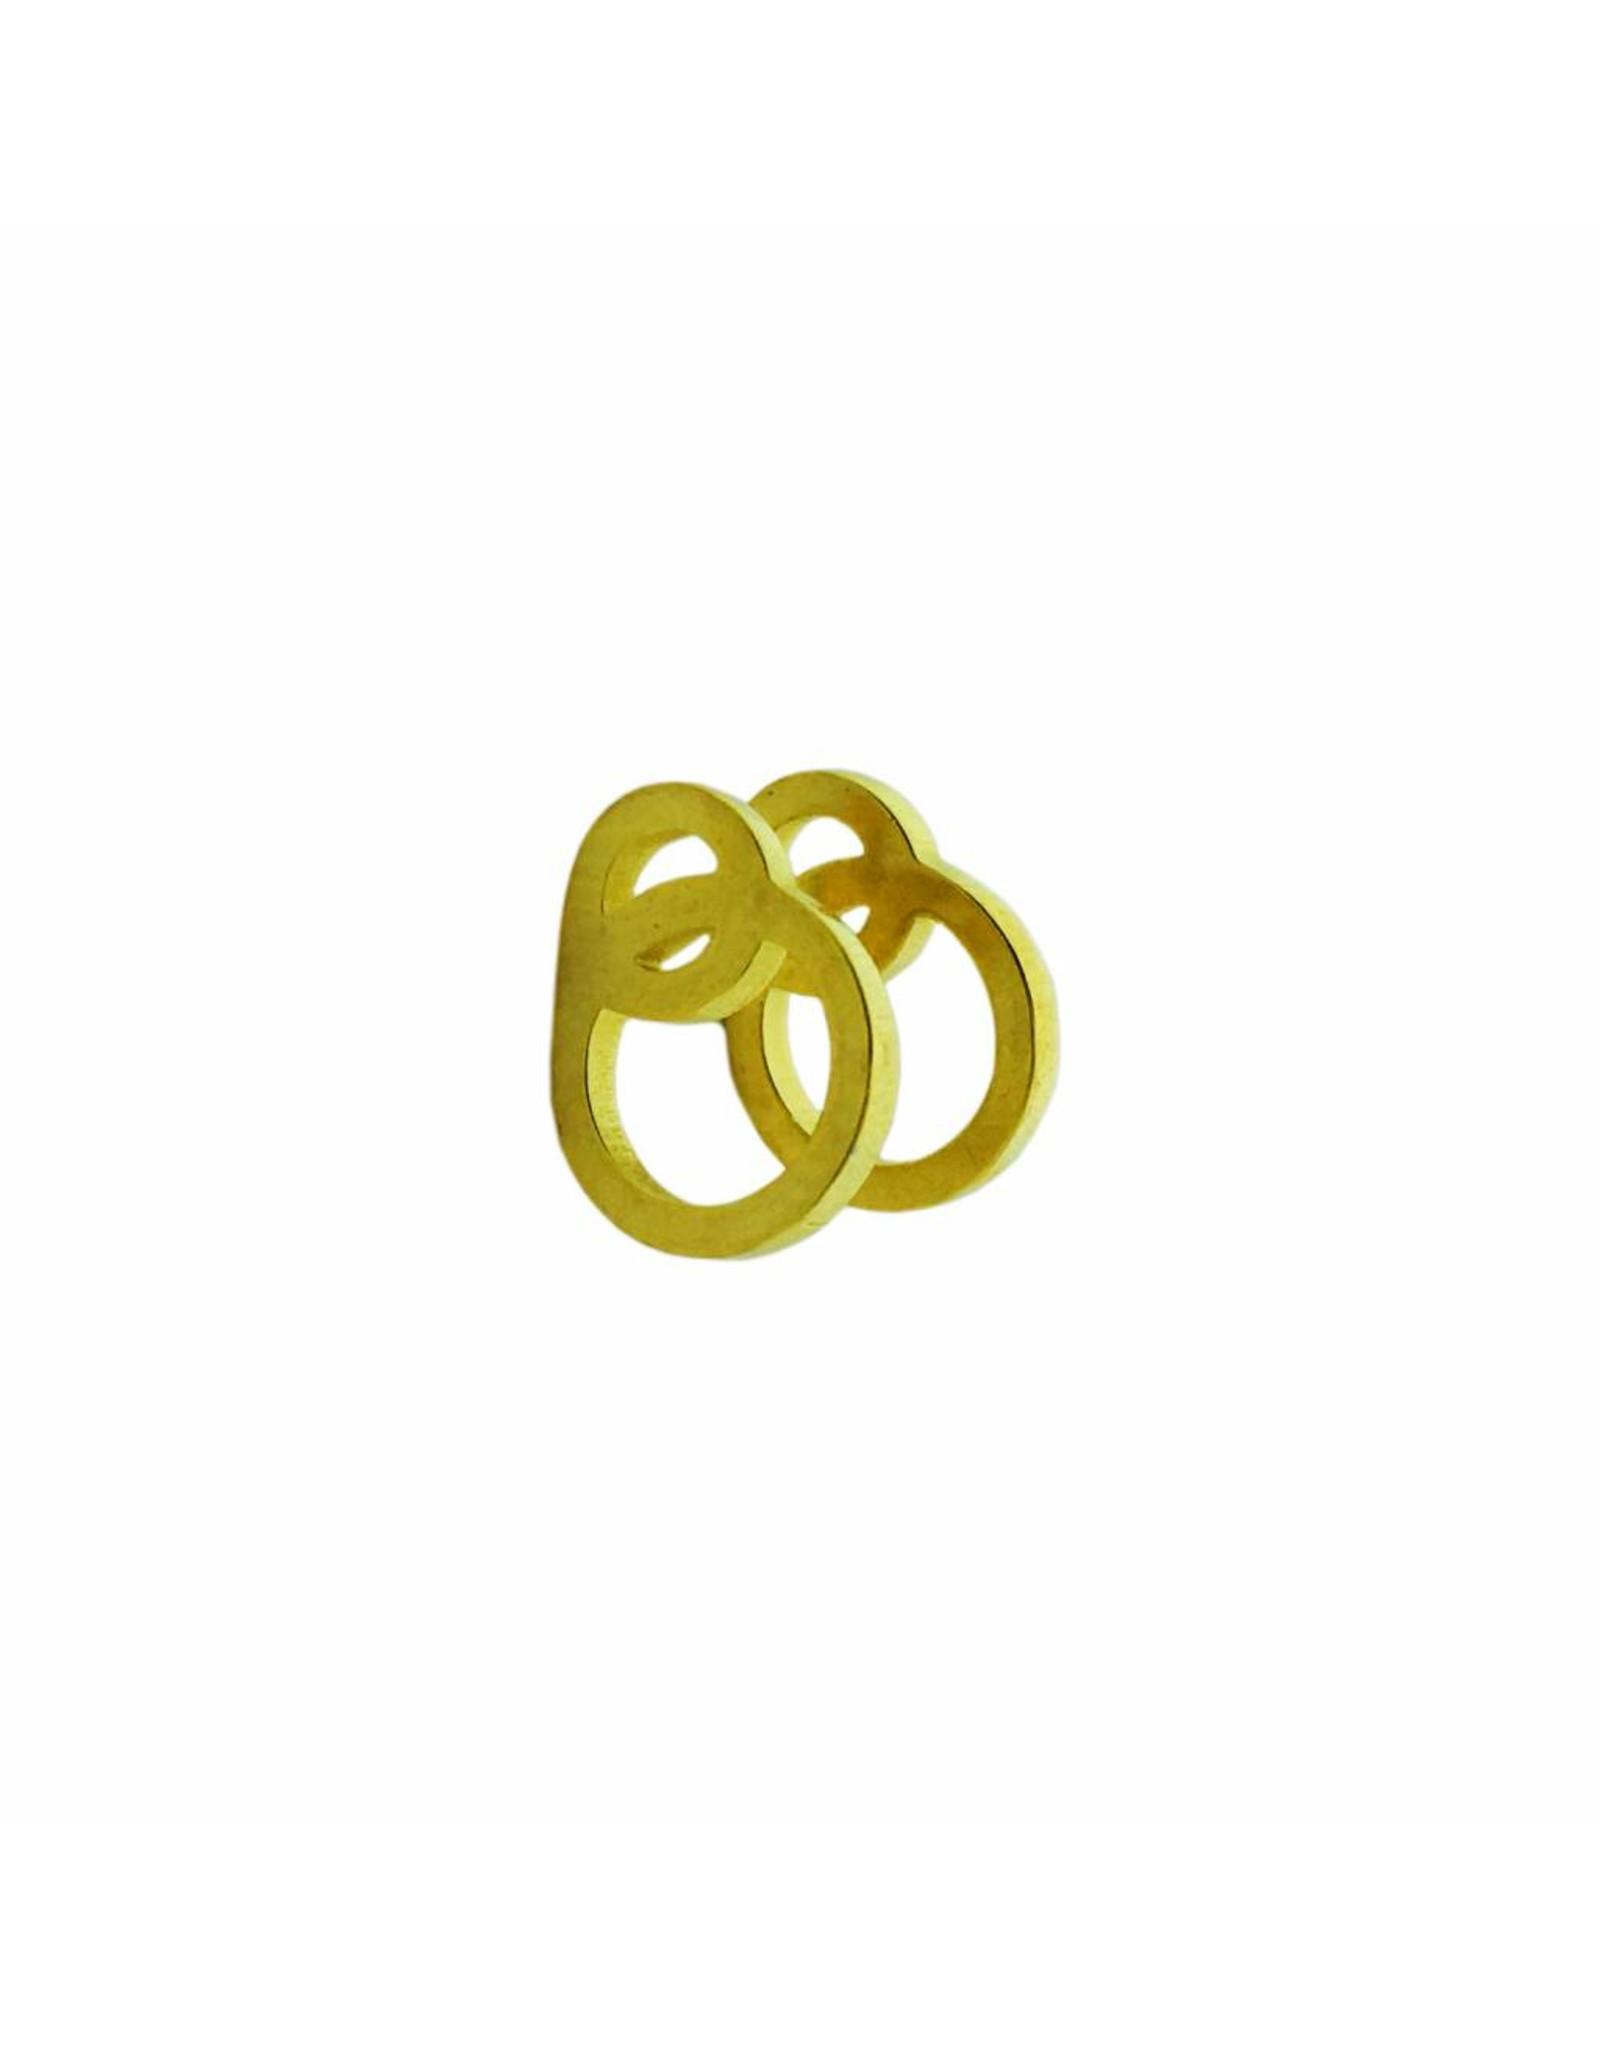 Stekertjes 3D cirkels goudkleurig